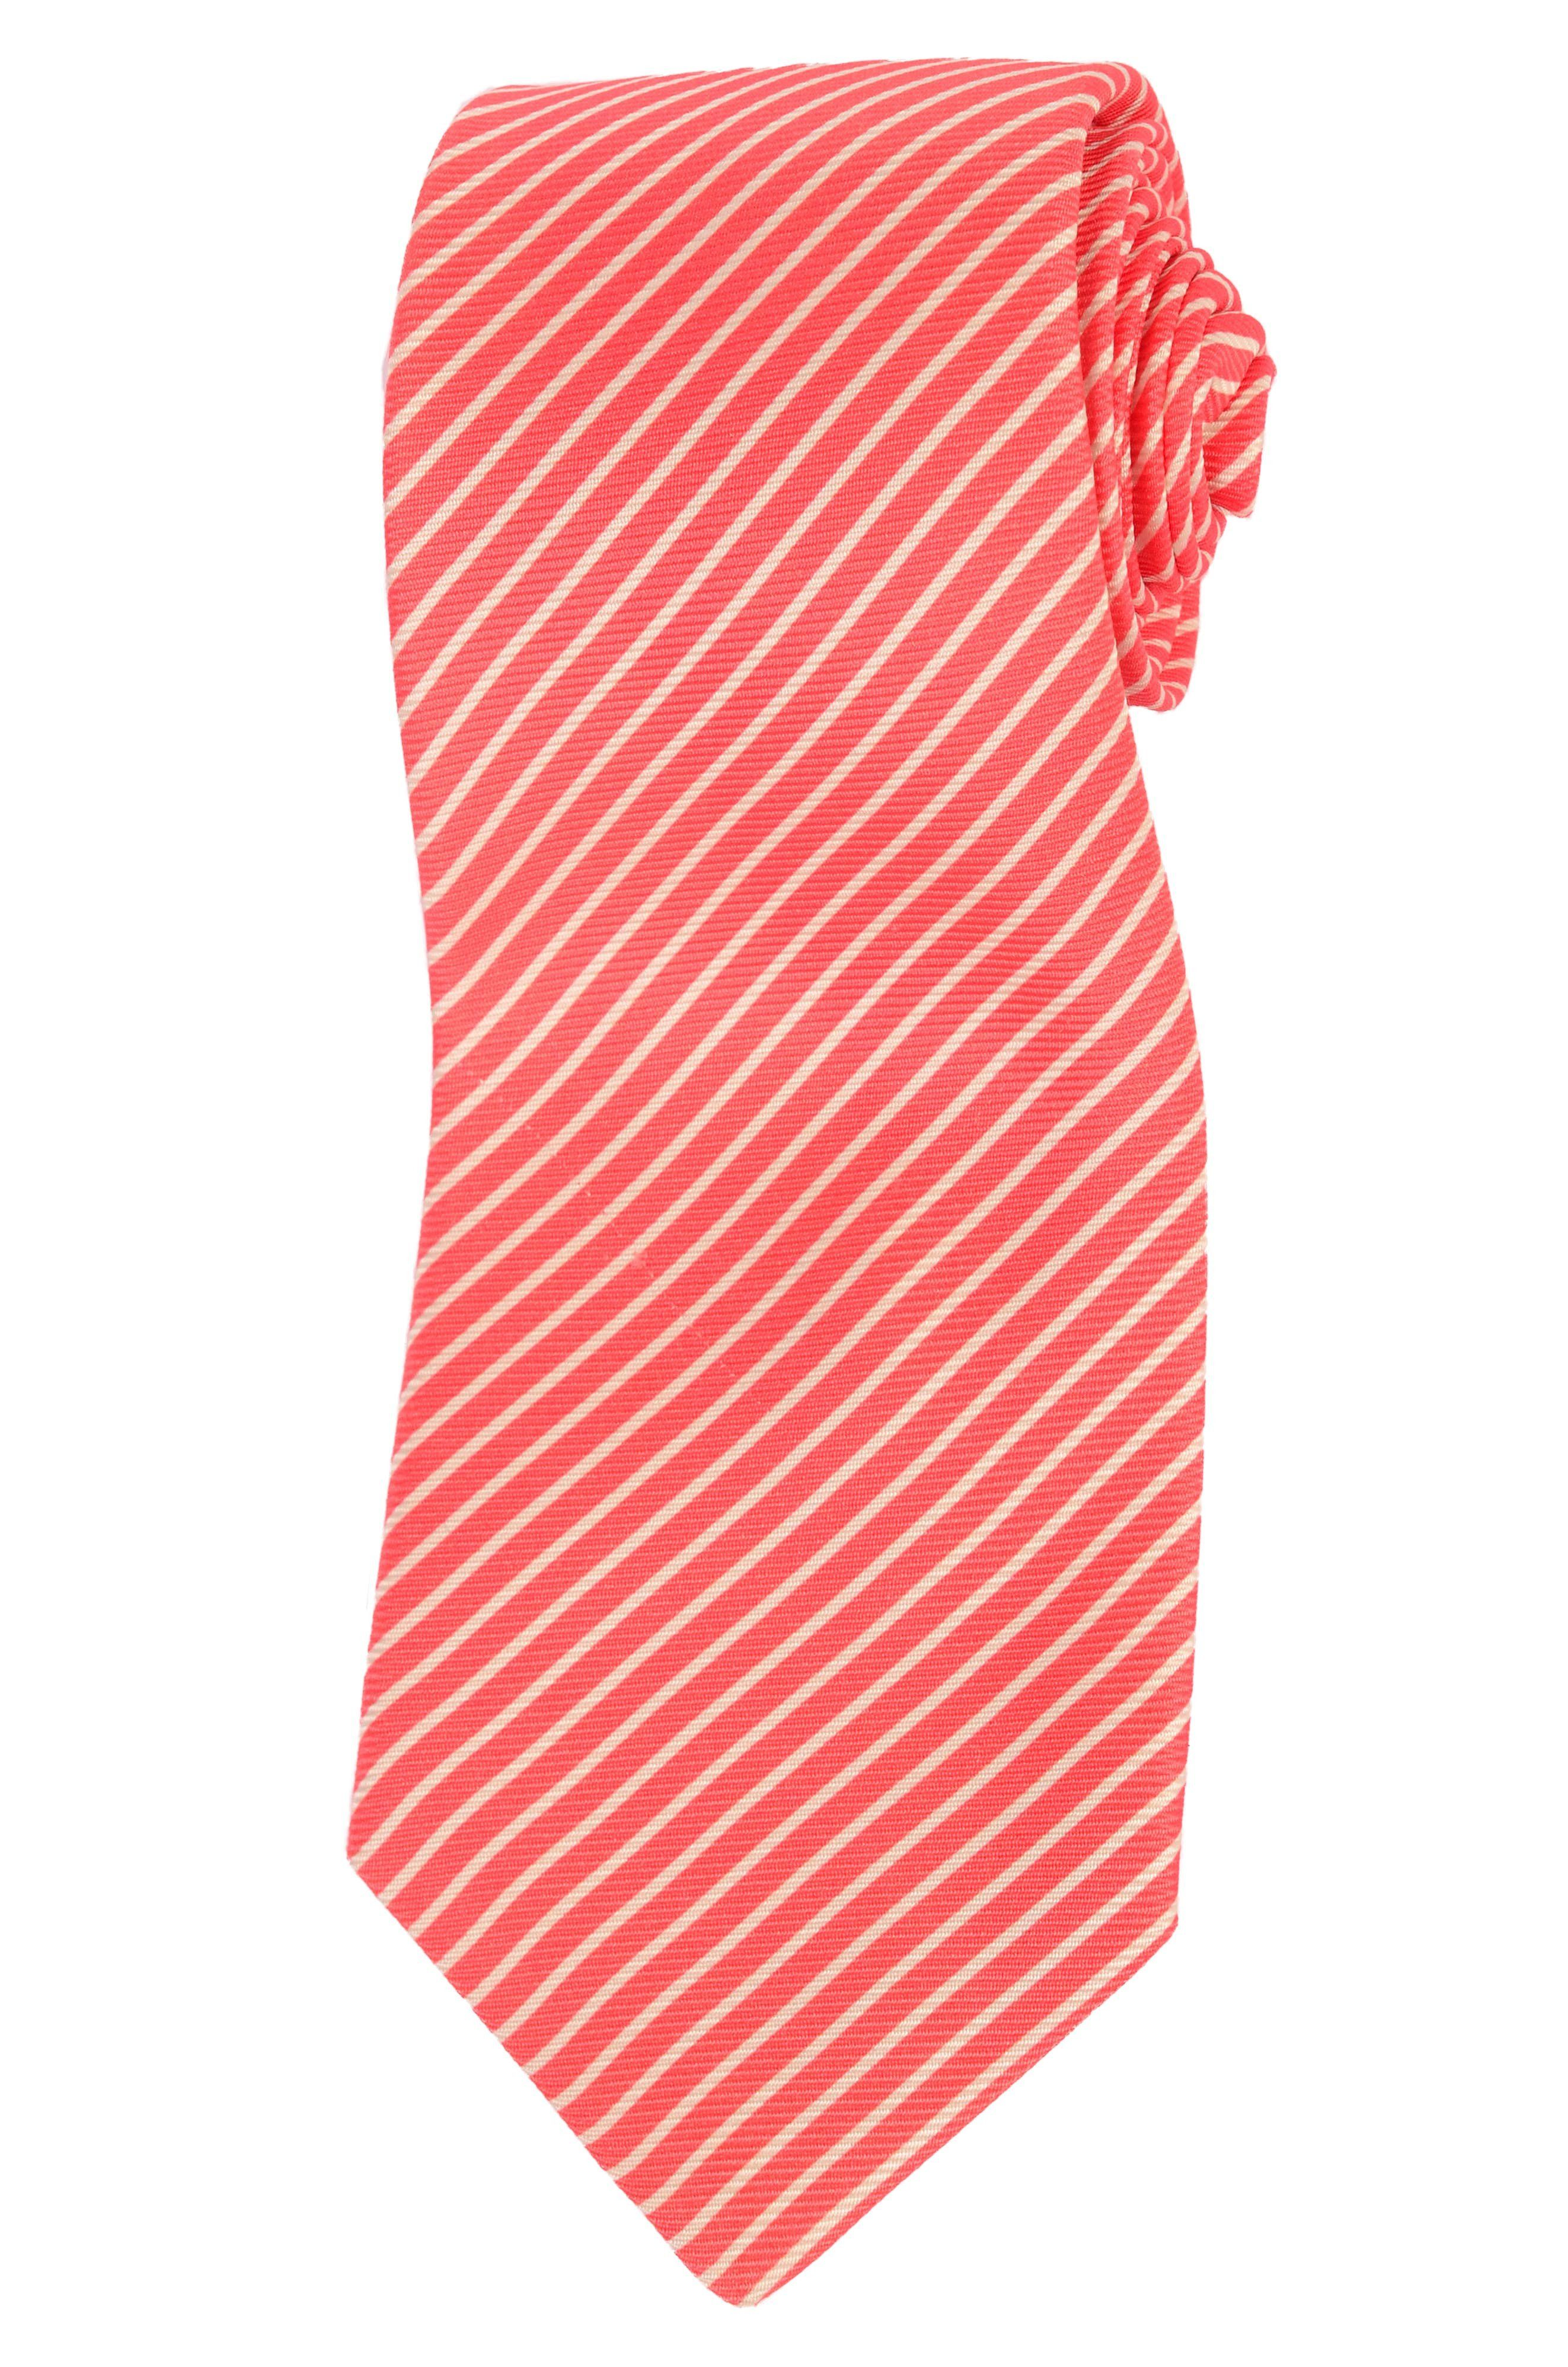 KITON Napoli Hand-Made Seven Fold Red-White Striped Silk Tie NEW